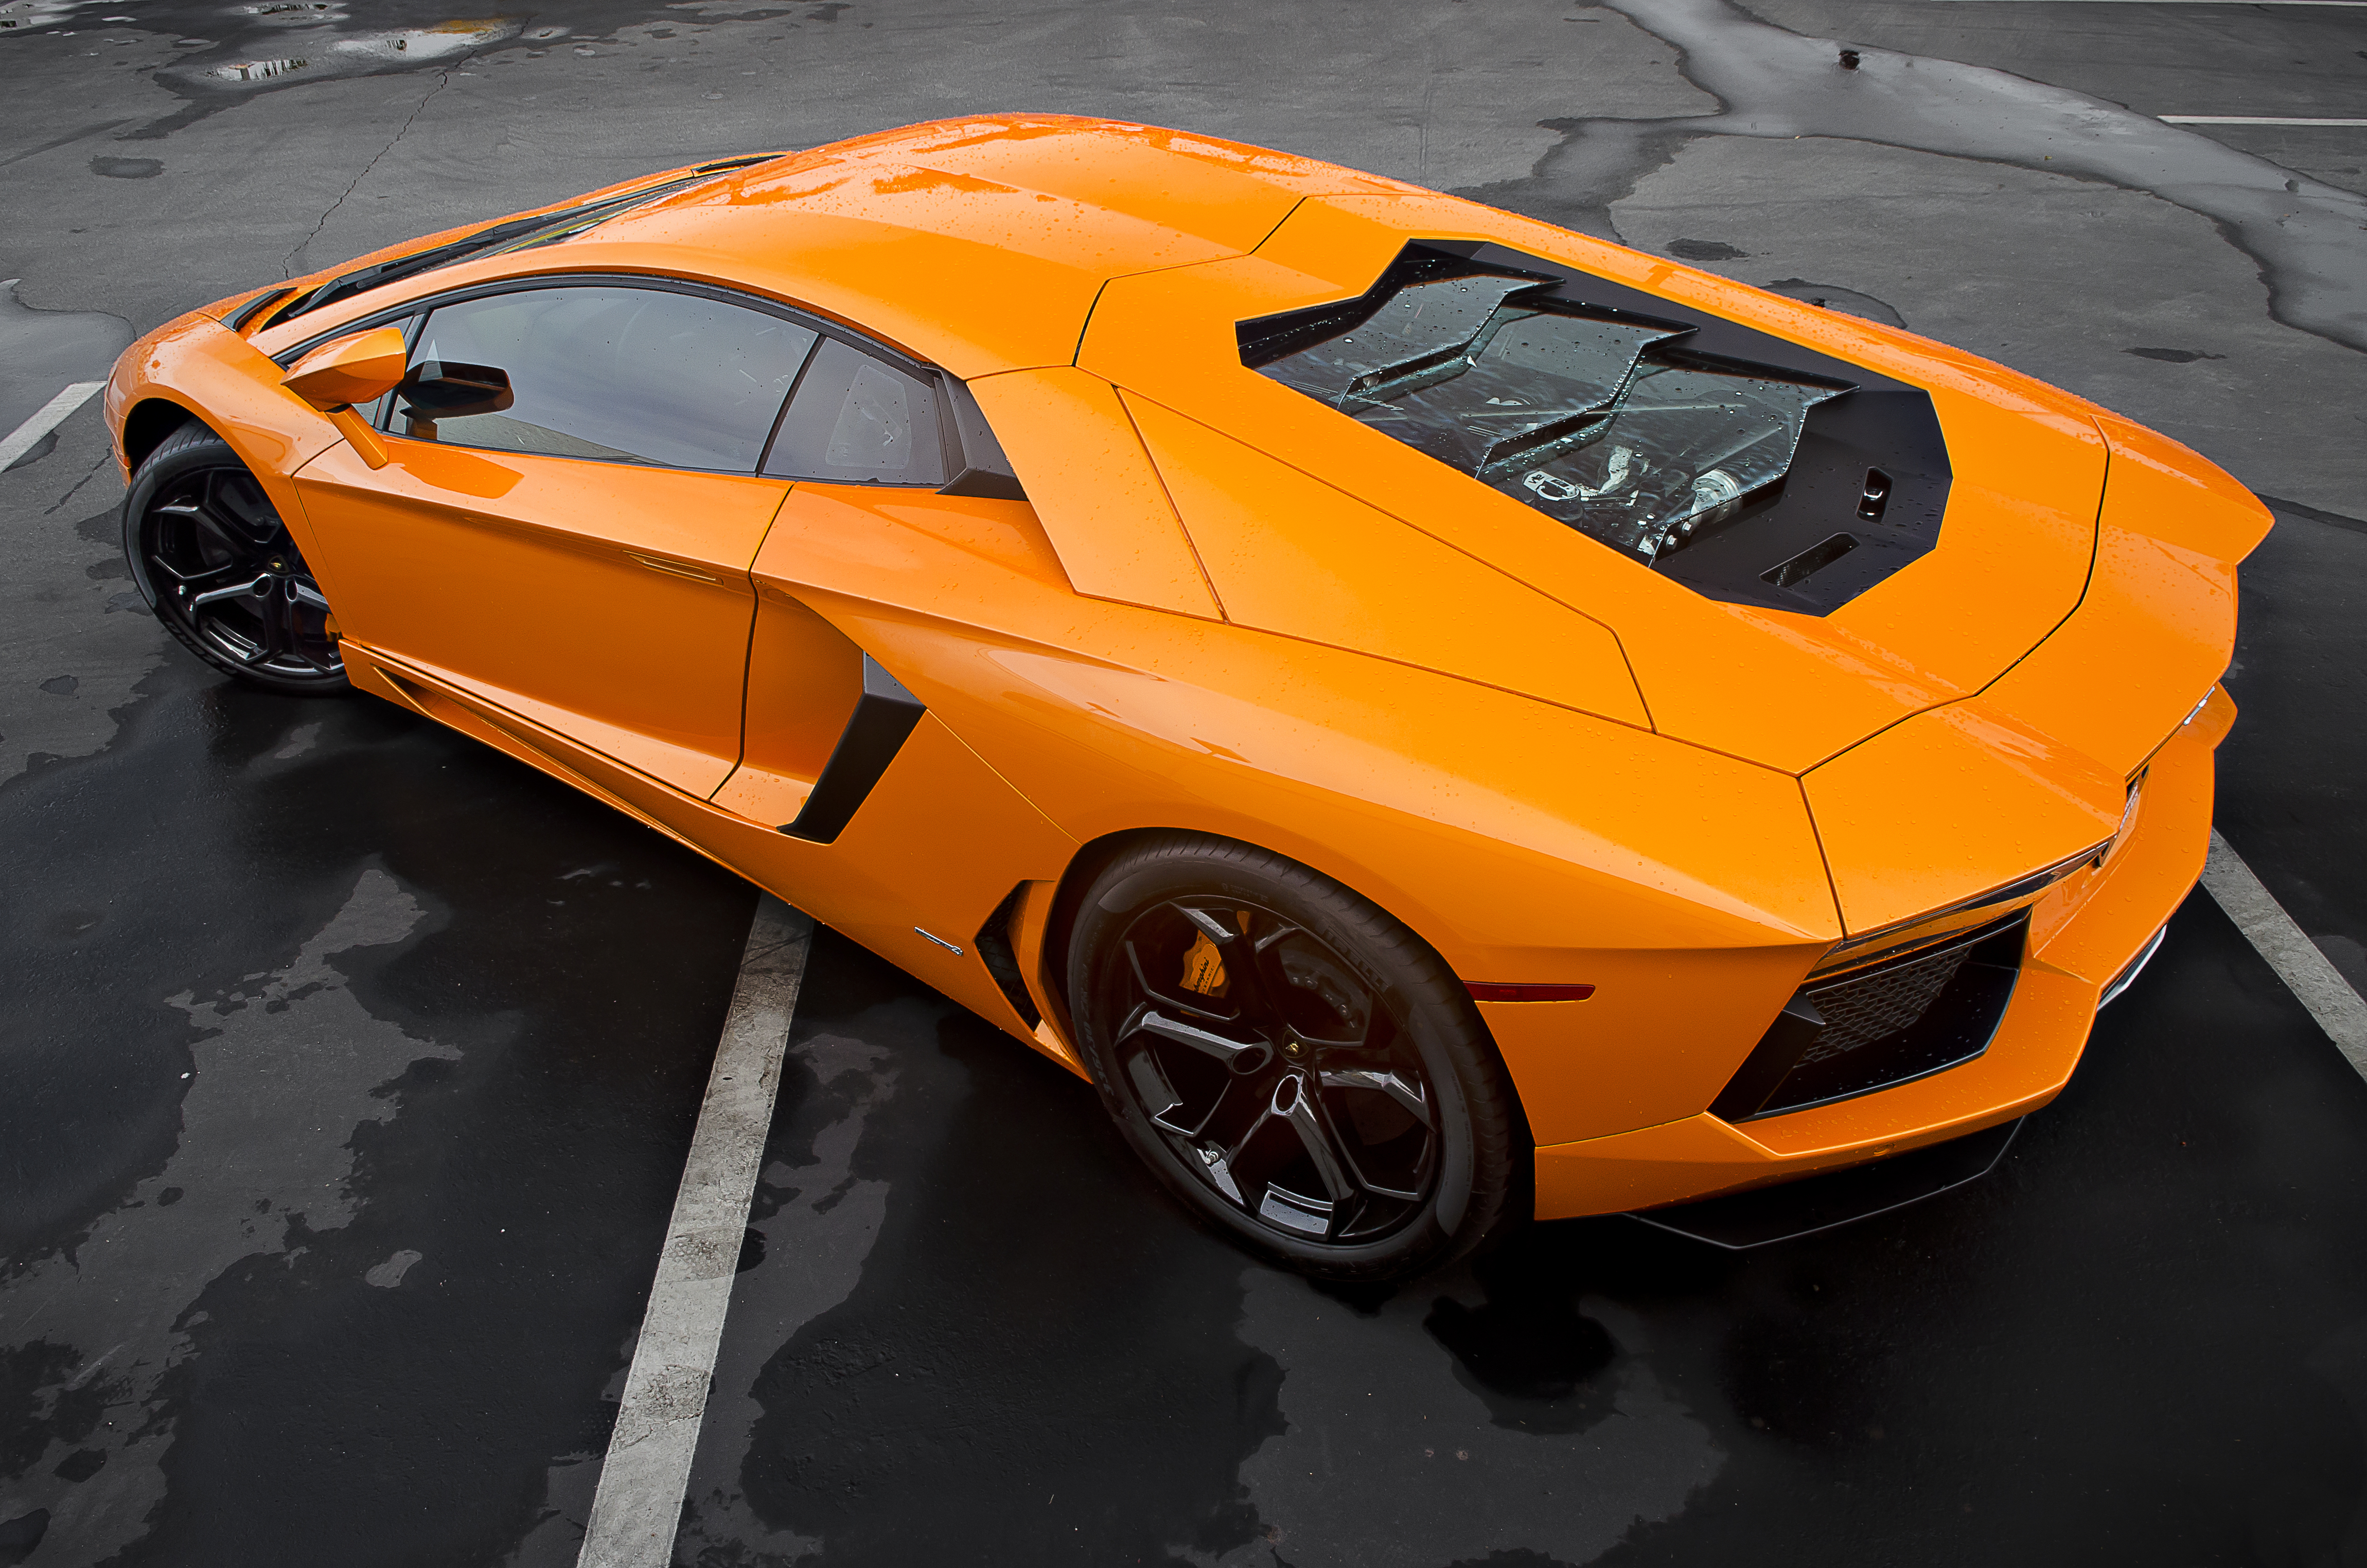 File Orange Lamborghini Aventador Lp700 4 12963397393 Jpg Wikimedia Commons